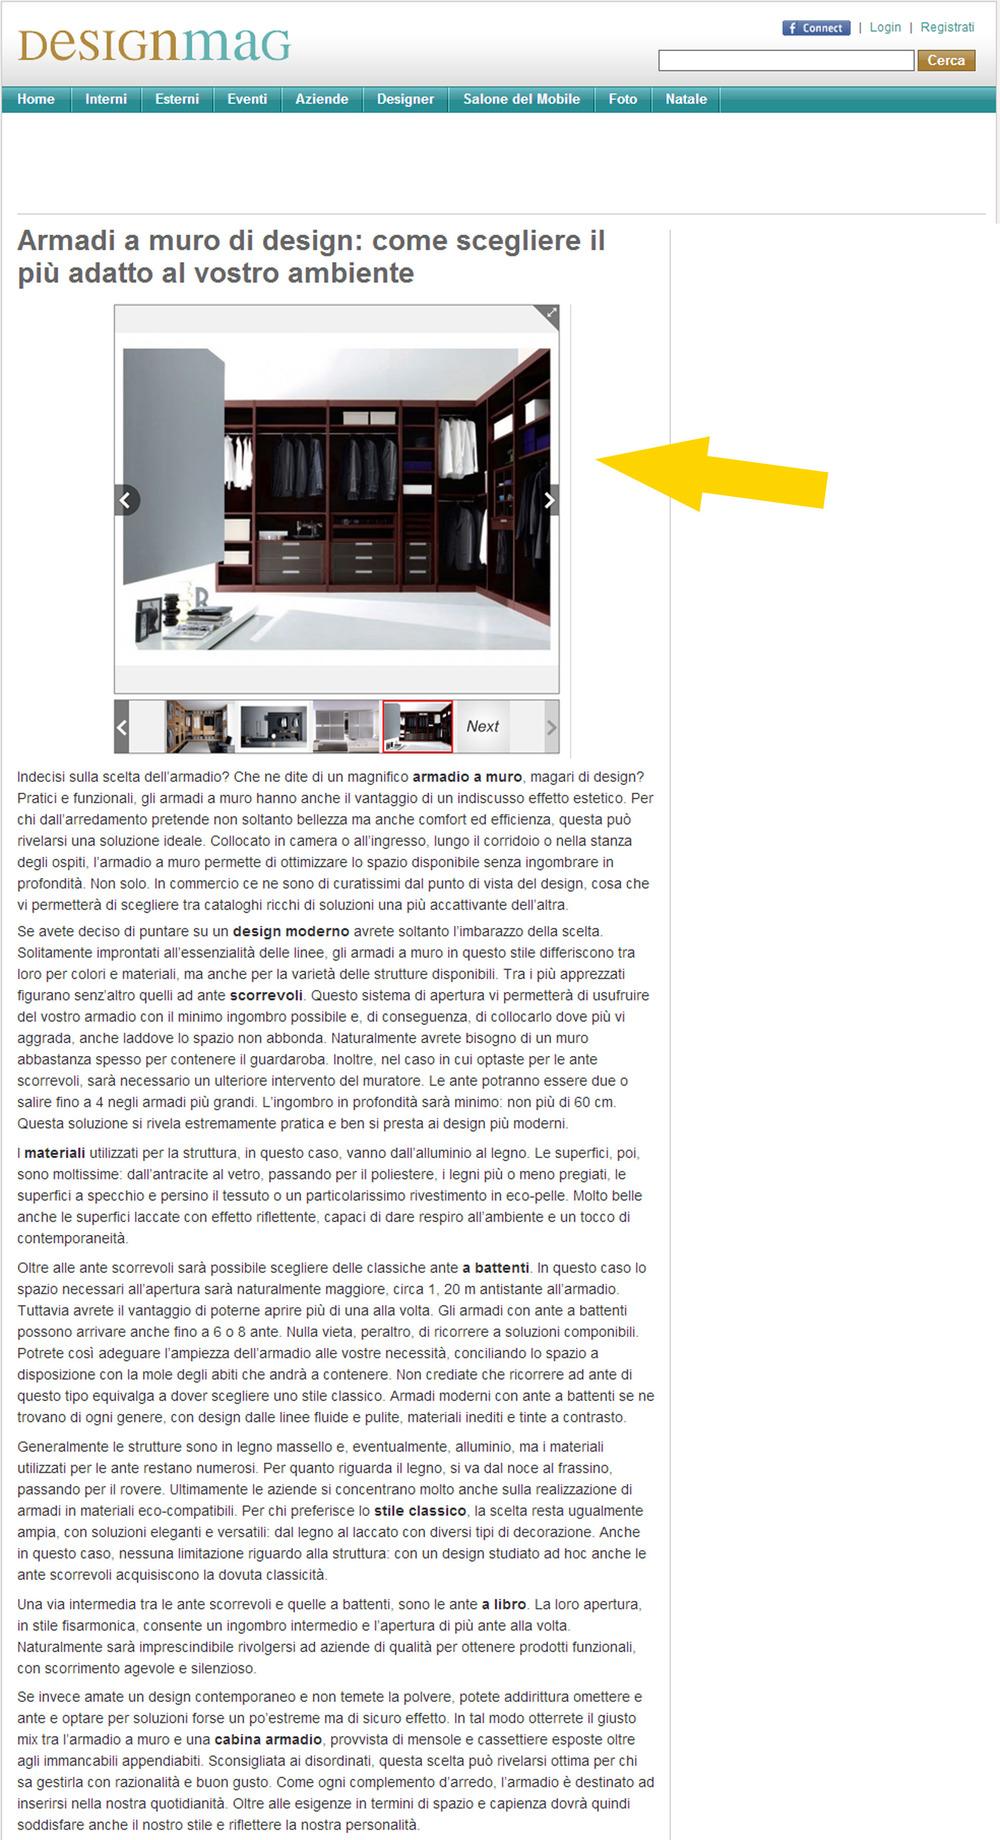 www.designmag.it 17 Dicembre 2012.jpg